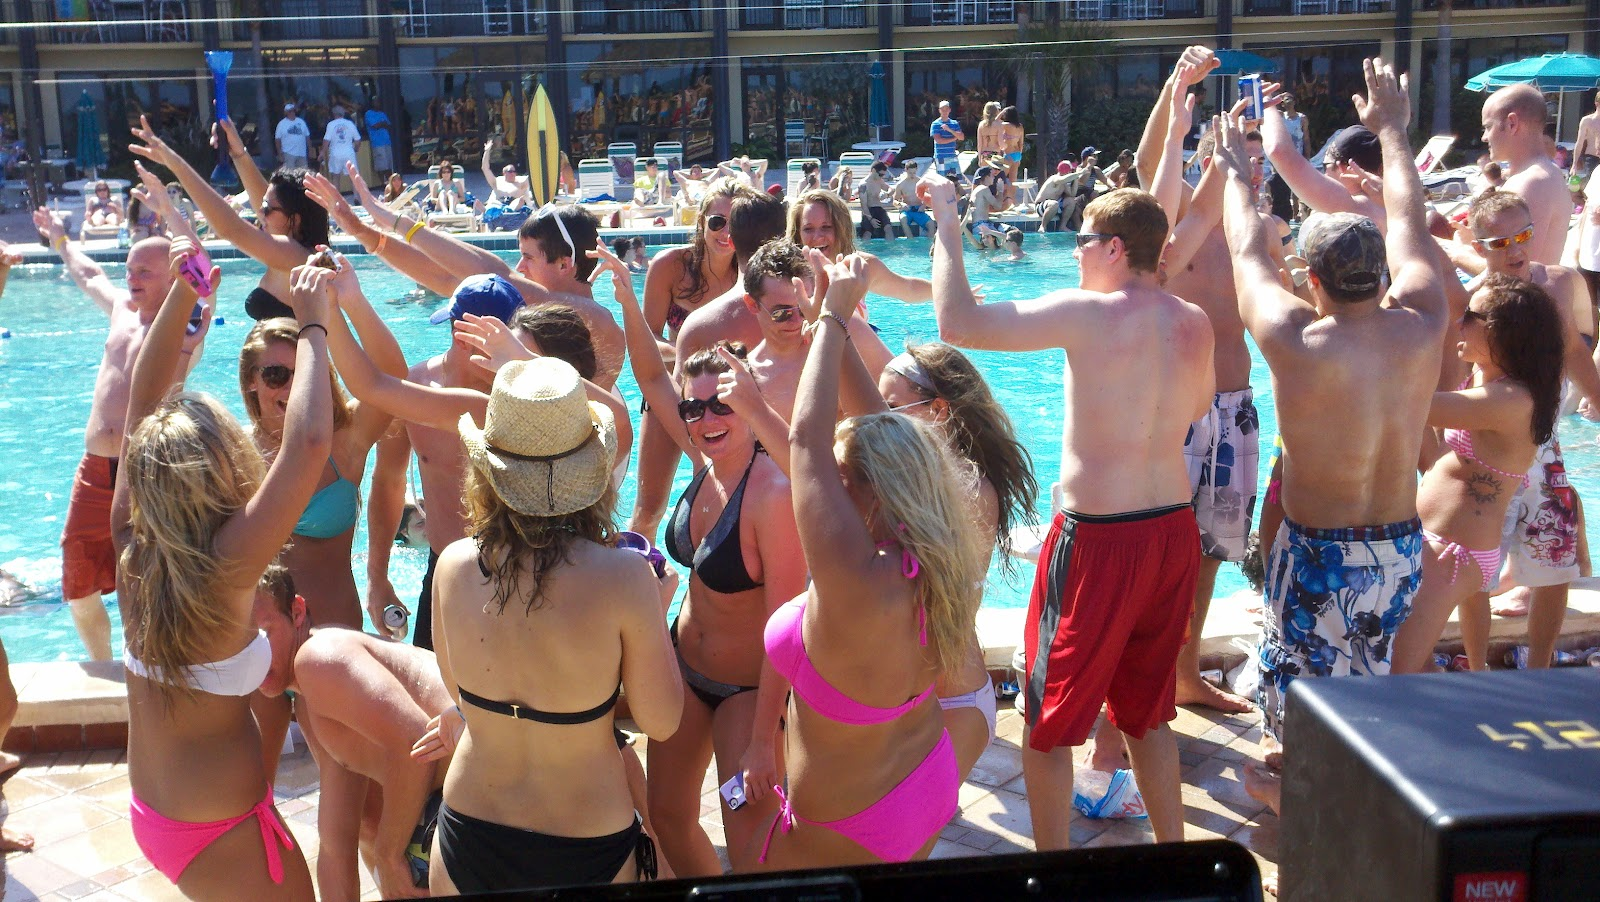 Swingers in south daytona florida Secrets Hideaway Resort and Spa - Florida Swinger Parties and Lifestyle Swingers Club